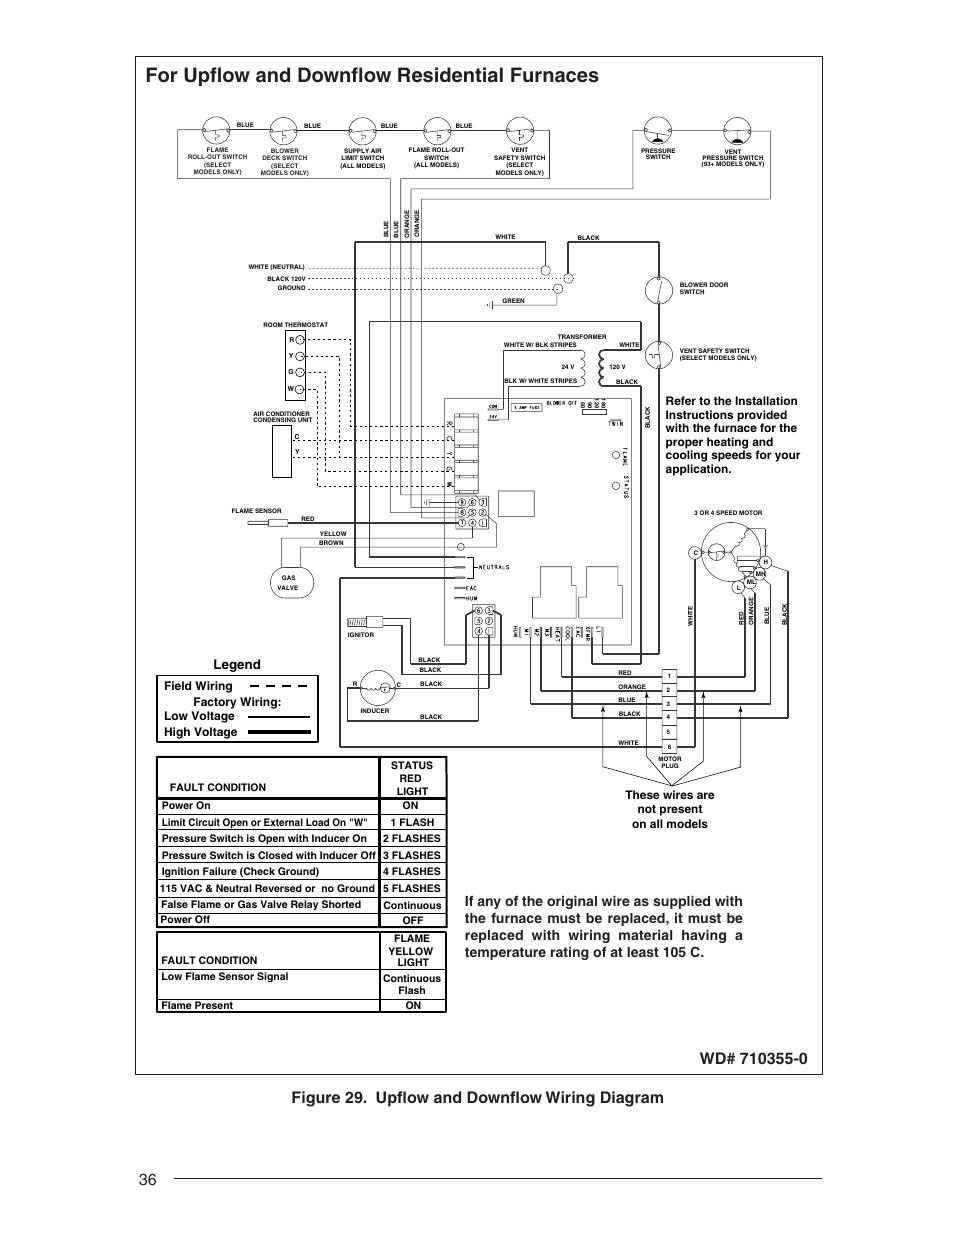 Ibanez Guitars Manuals Ibanez Guitars Manuals Ibanez Rg Wiring Diagram Wiring Wiring Diagram And Schematics Series Wiring Diagram Ibanez Rg 370 35 27 35 ...